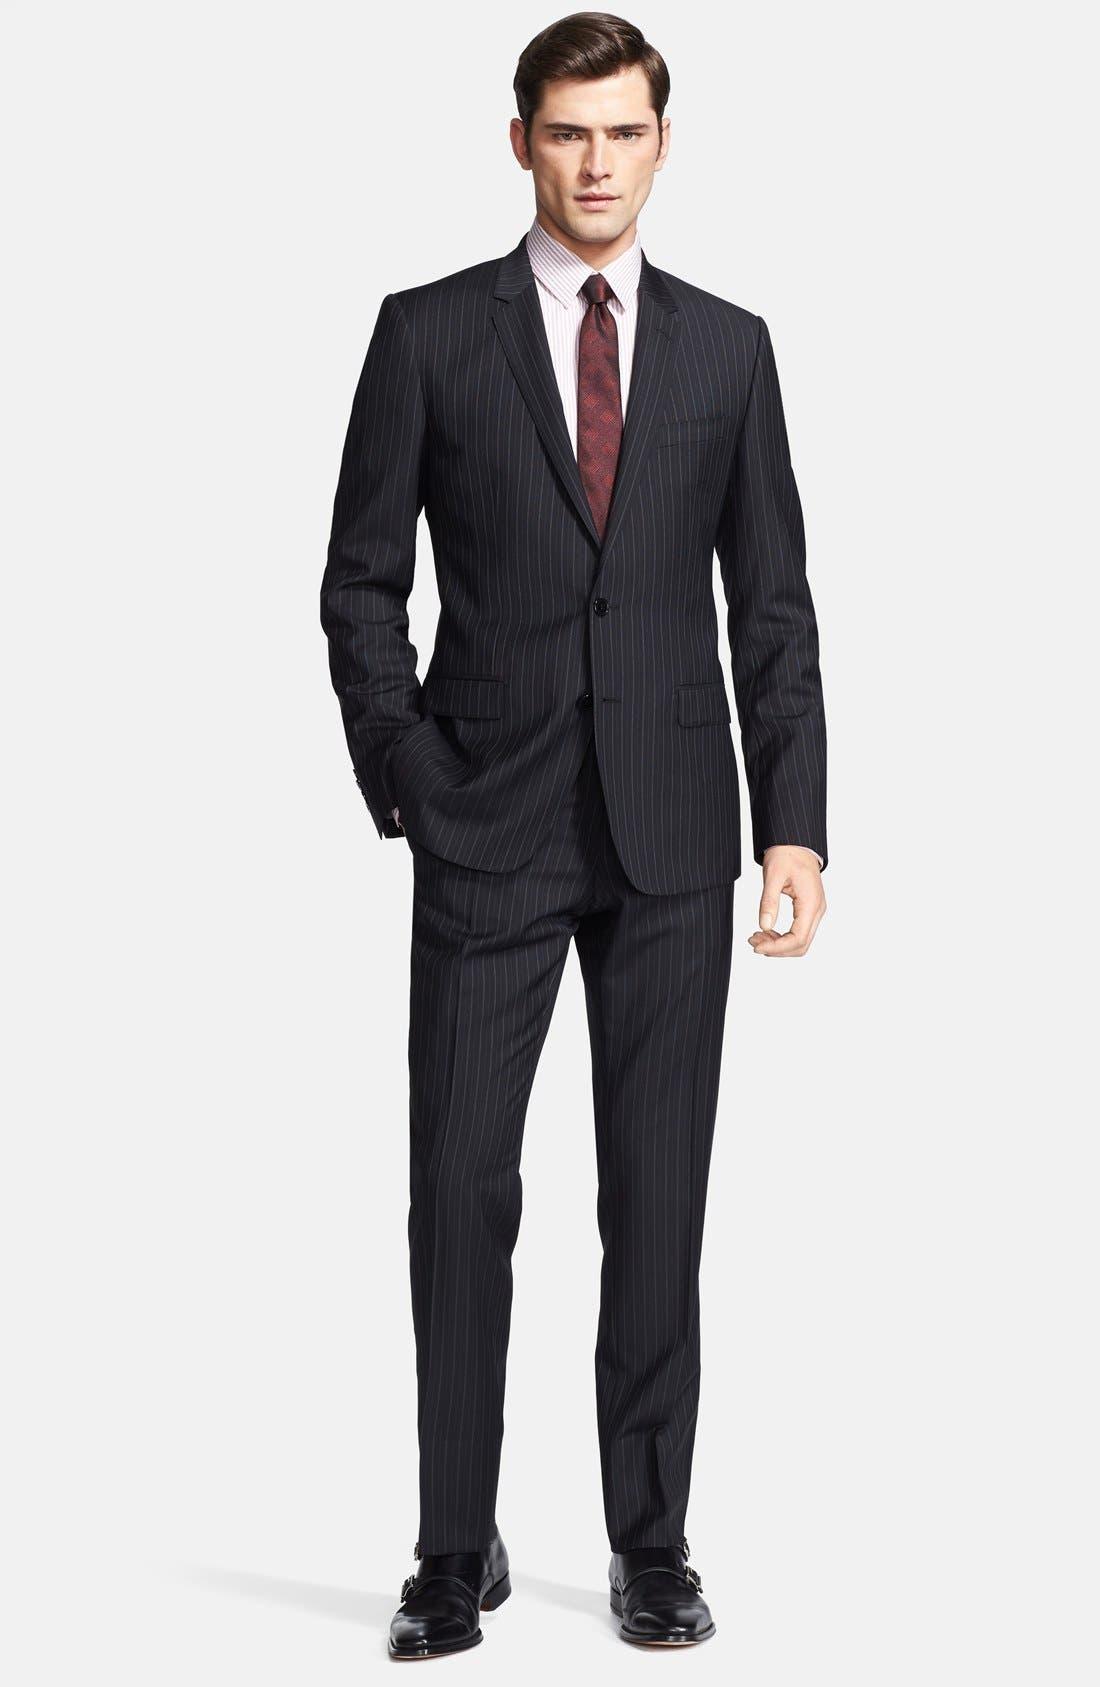 Main Image - Dolce&Gabbana 'Martini' Black Stripe Wool Suit